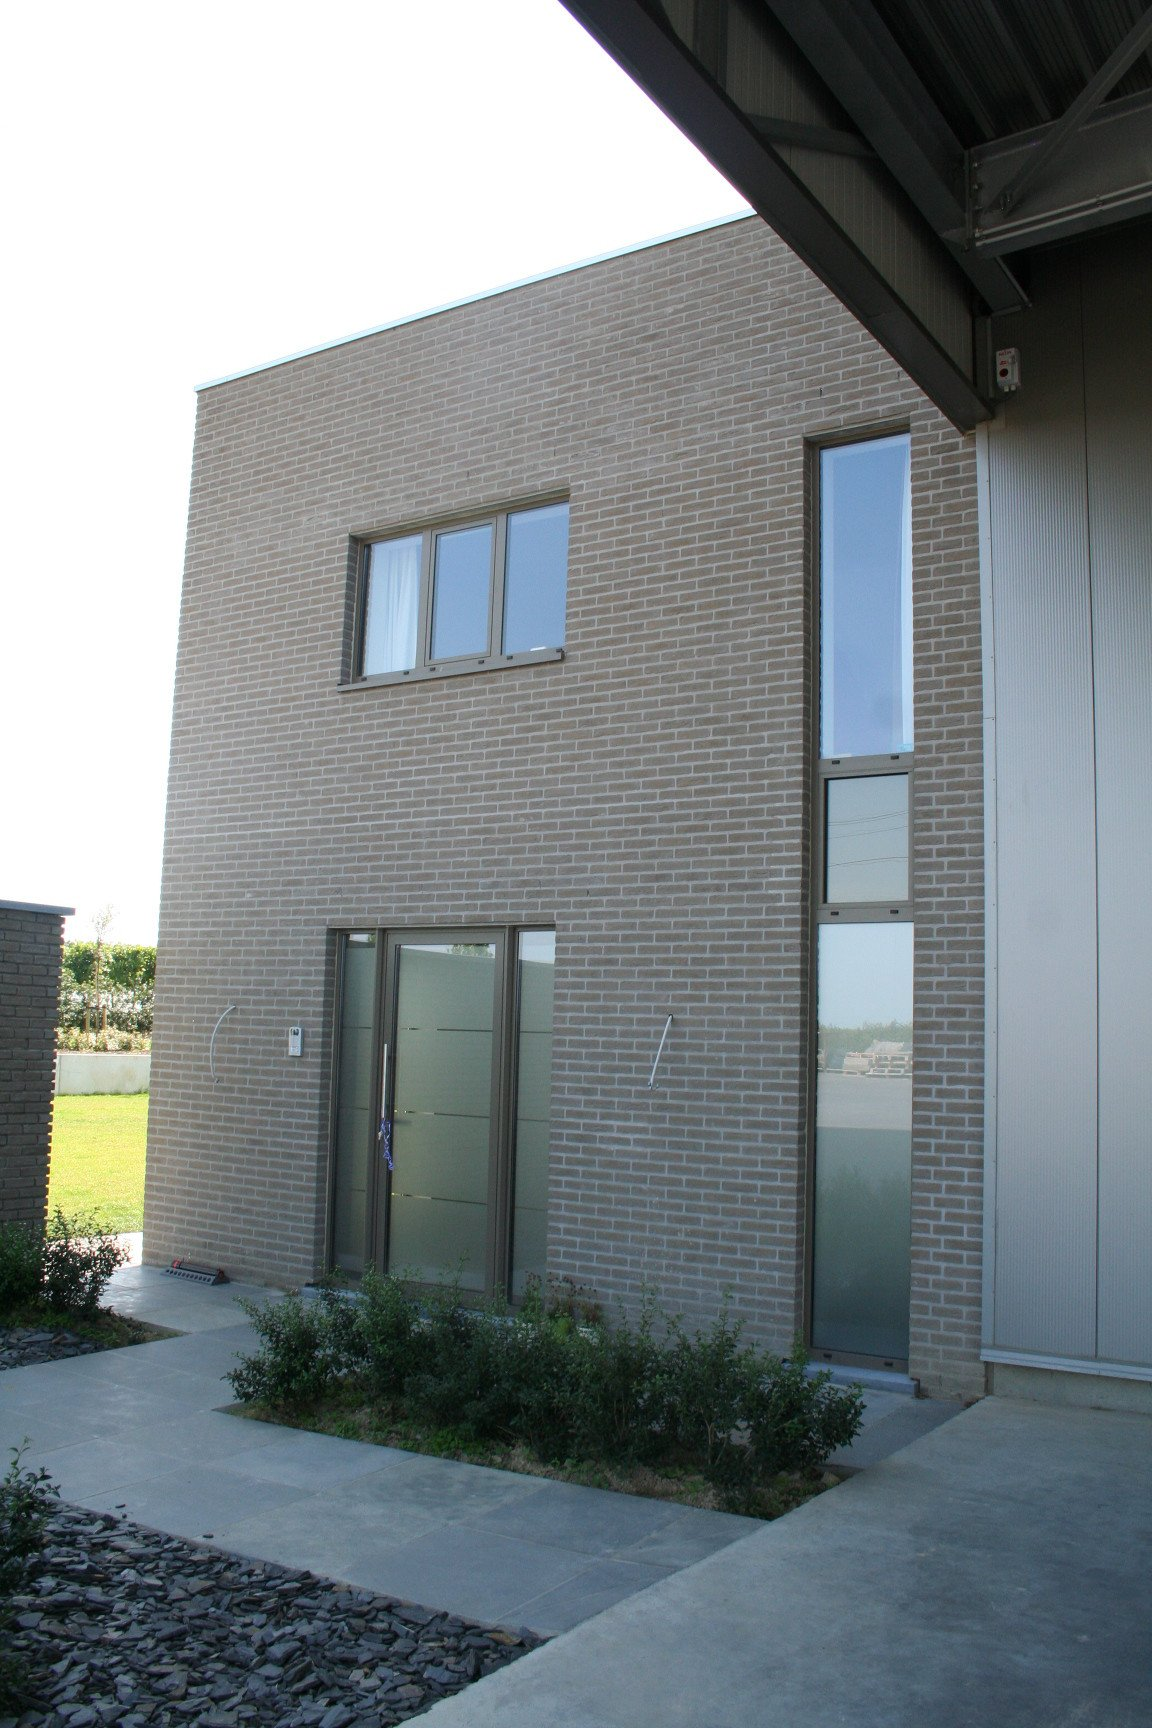 Carubin_Pittem_kmo-gebouw met geïntegreerde woning (2).jpg